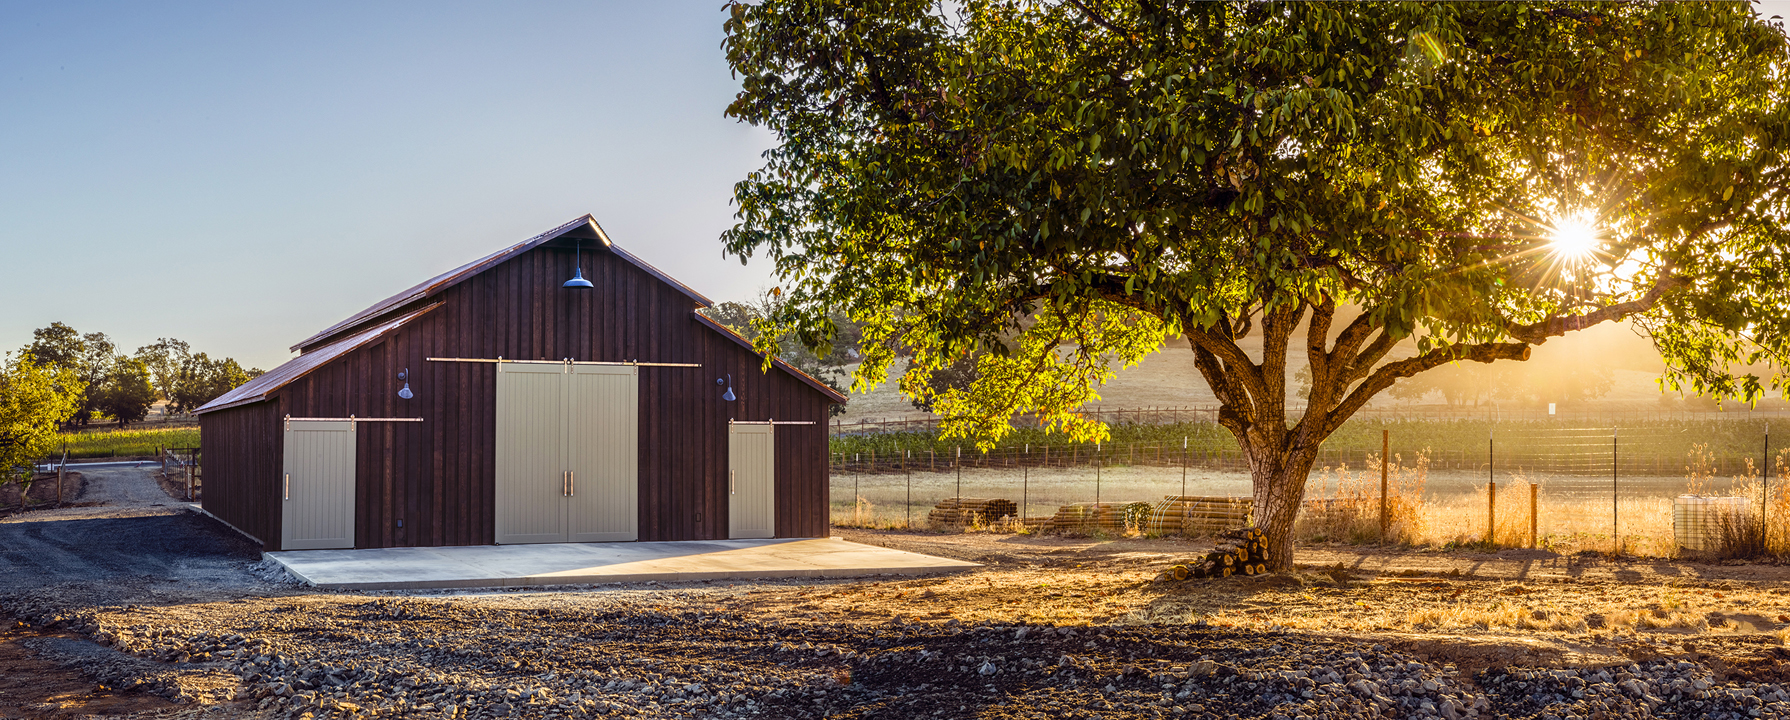 Barn Const final 20x8-Crop.jpg